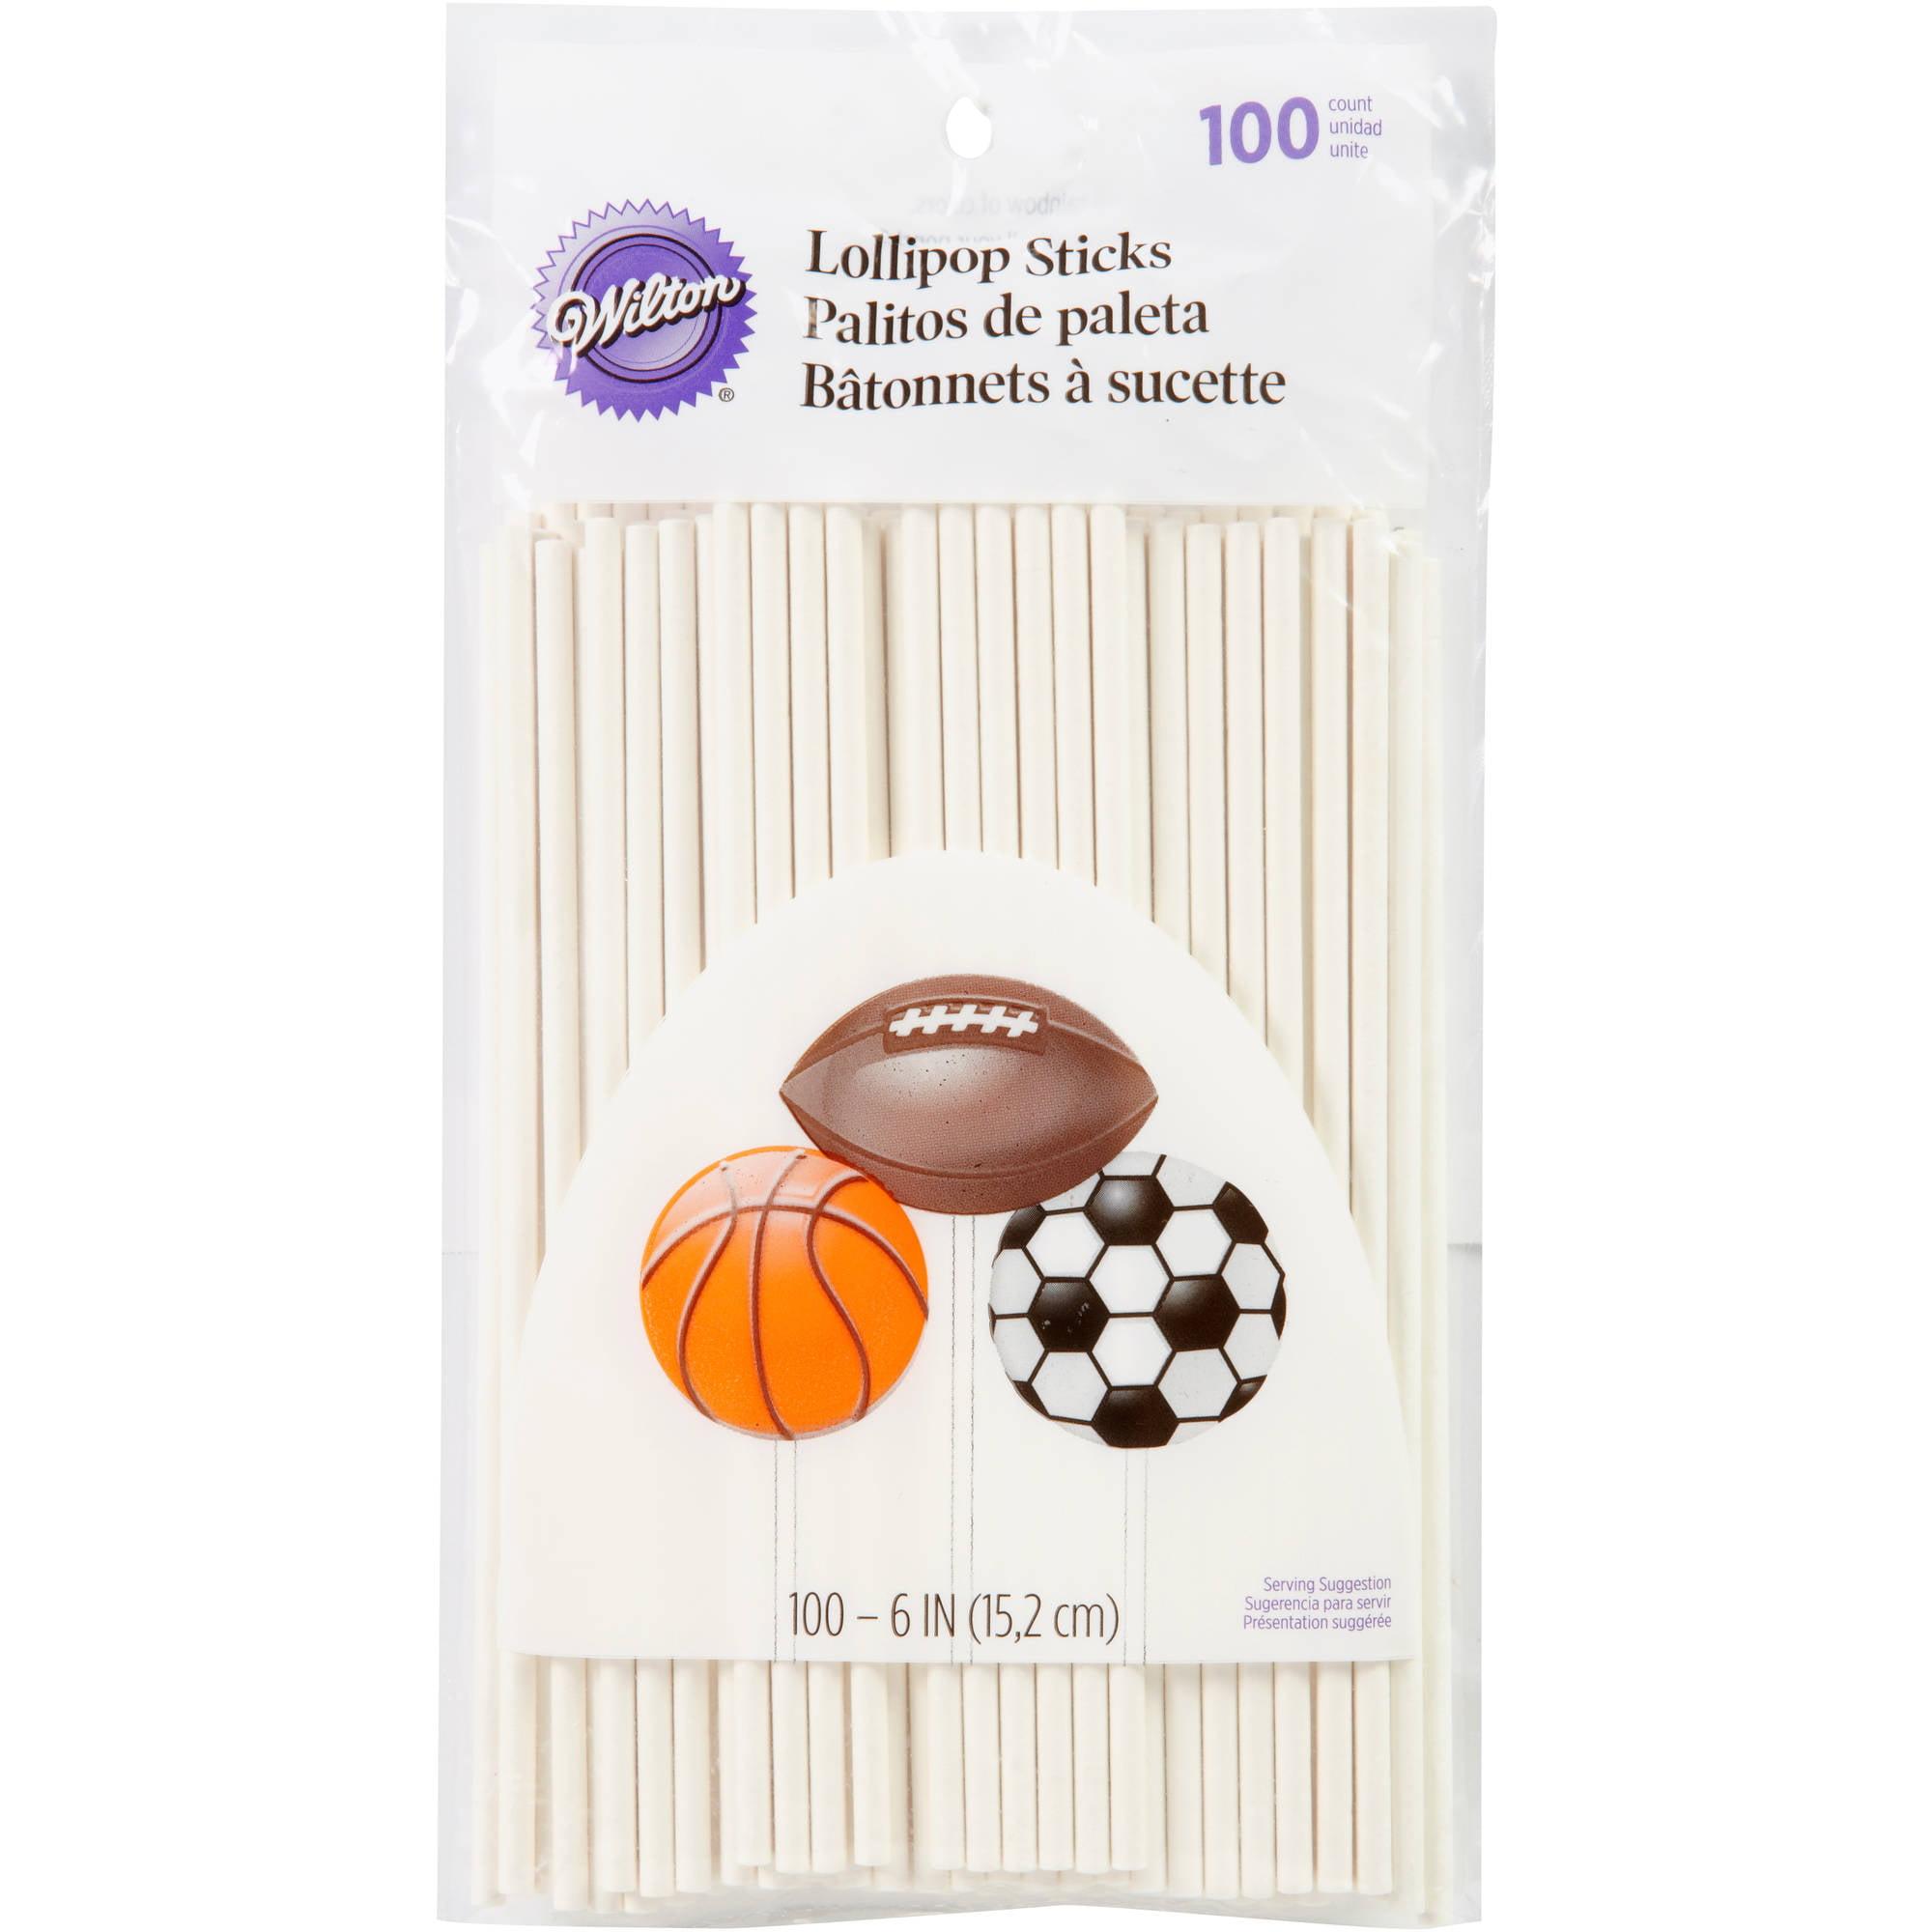 "Wilton 6"" Lollipop Sticks, White 100 ct. 1912-1002"